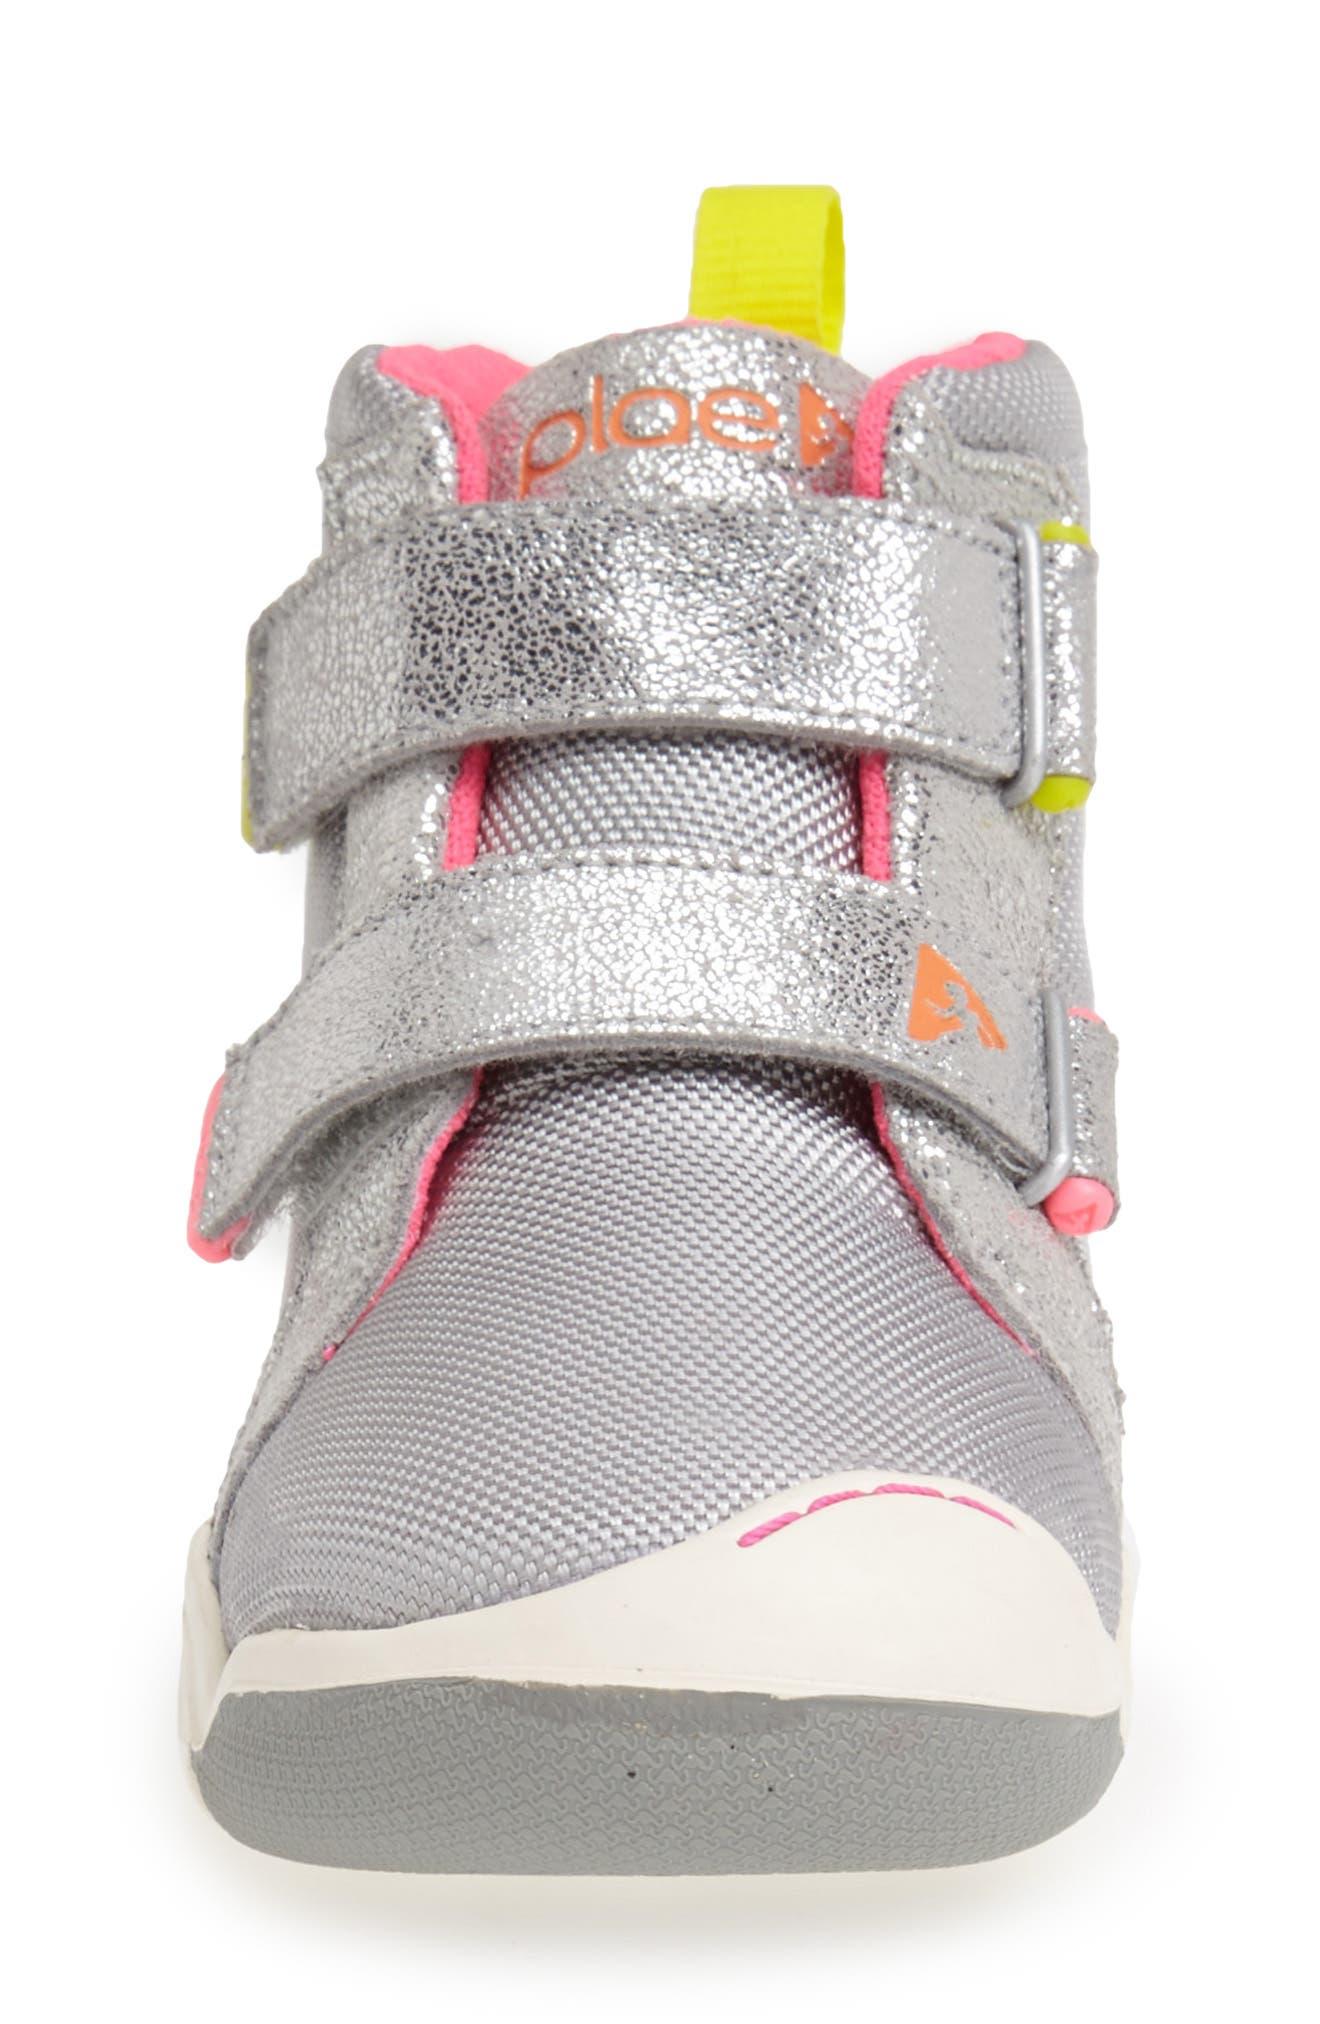 'Max' Customizable High Top Sneaker,                             Alternate thumbnail 5, color,                             040